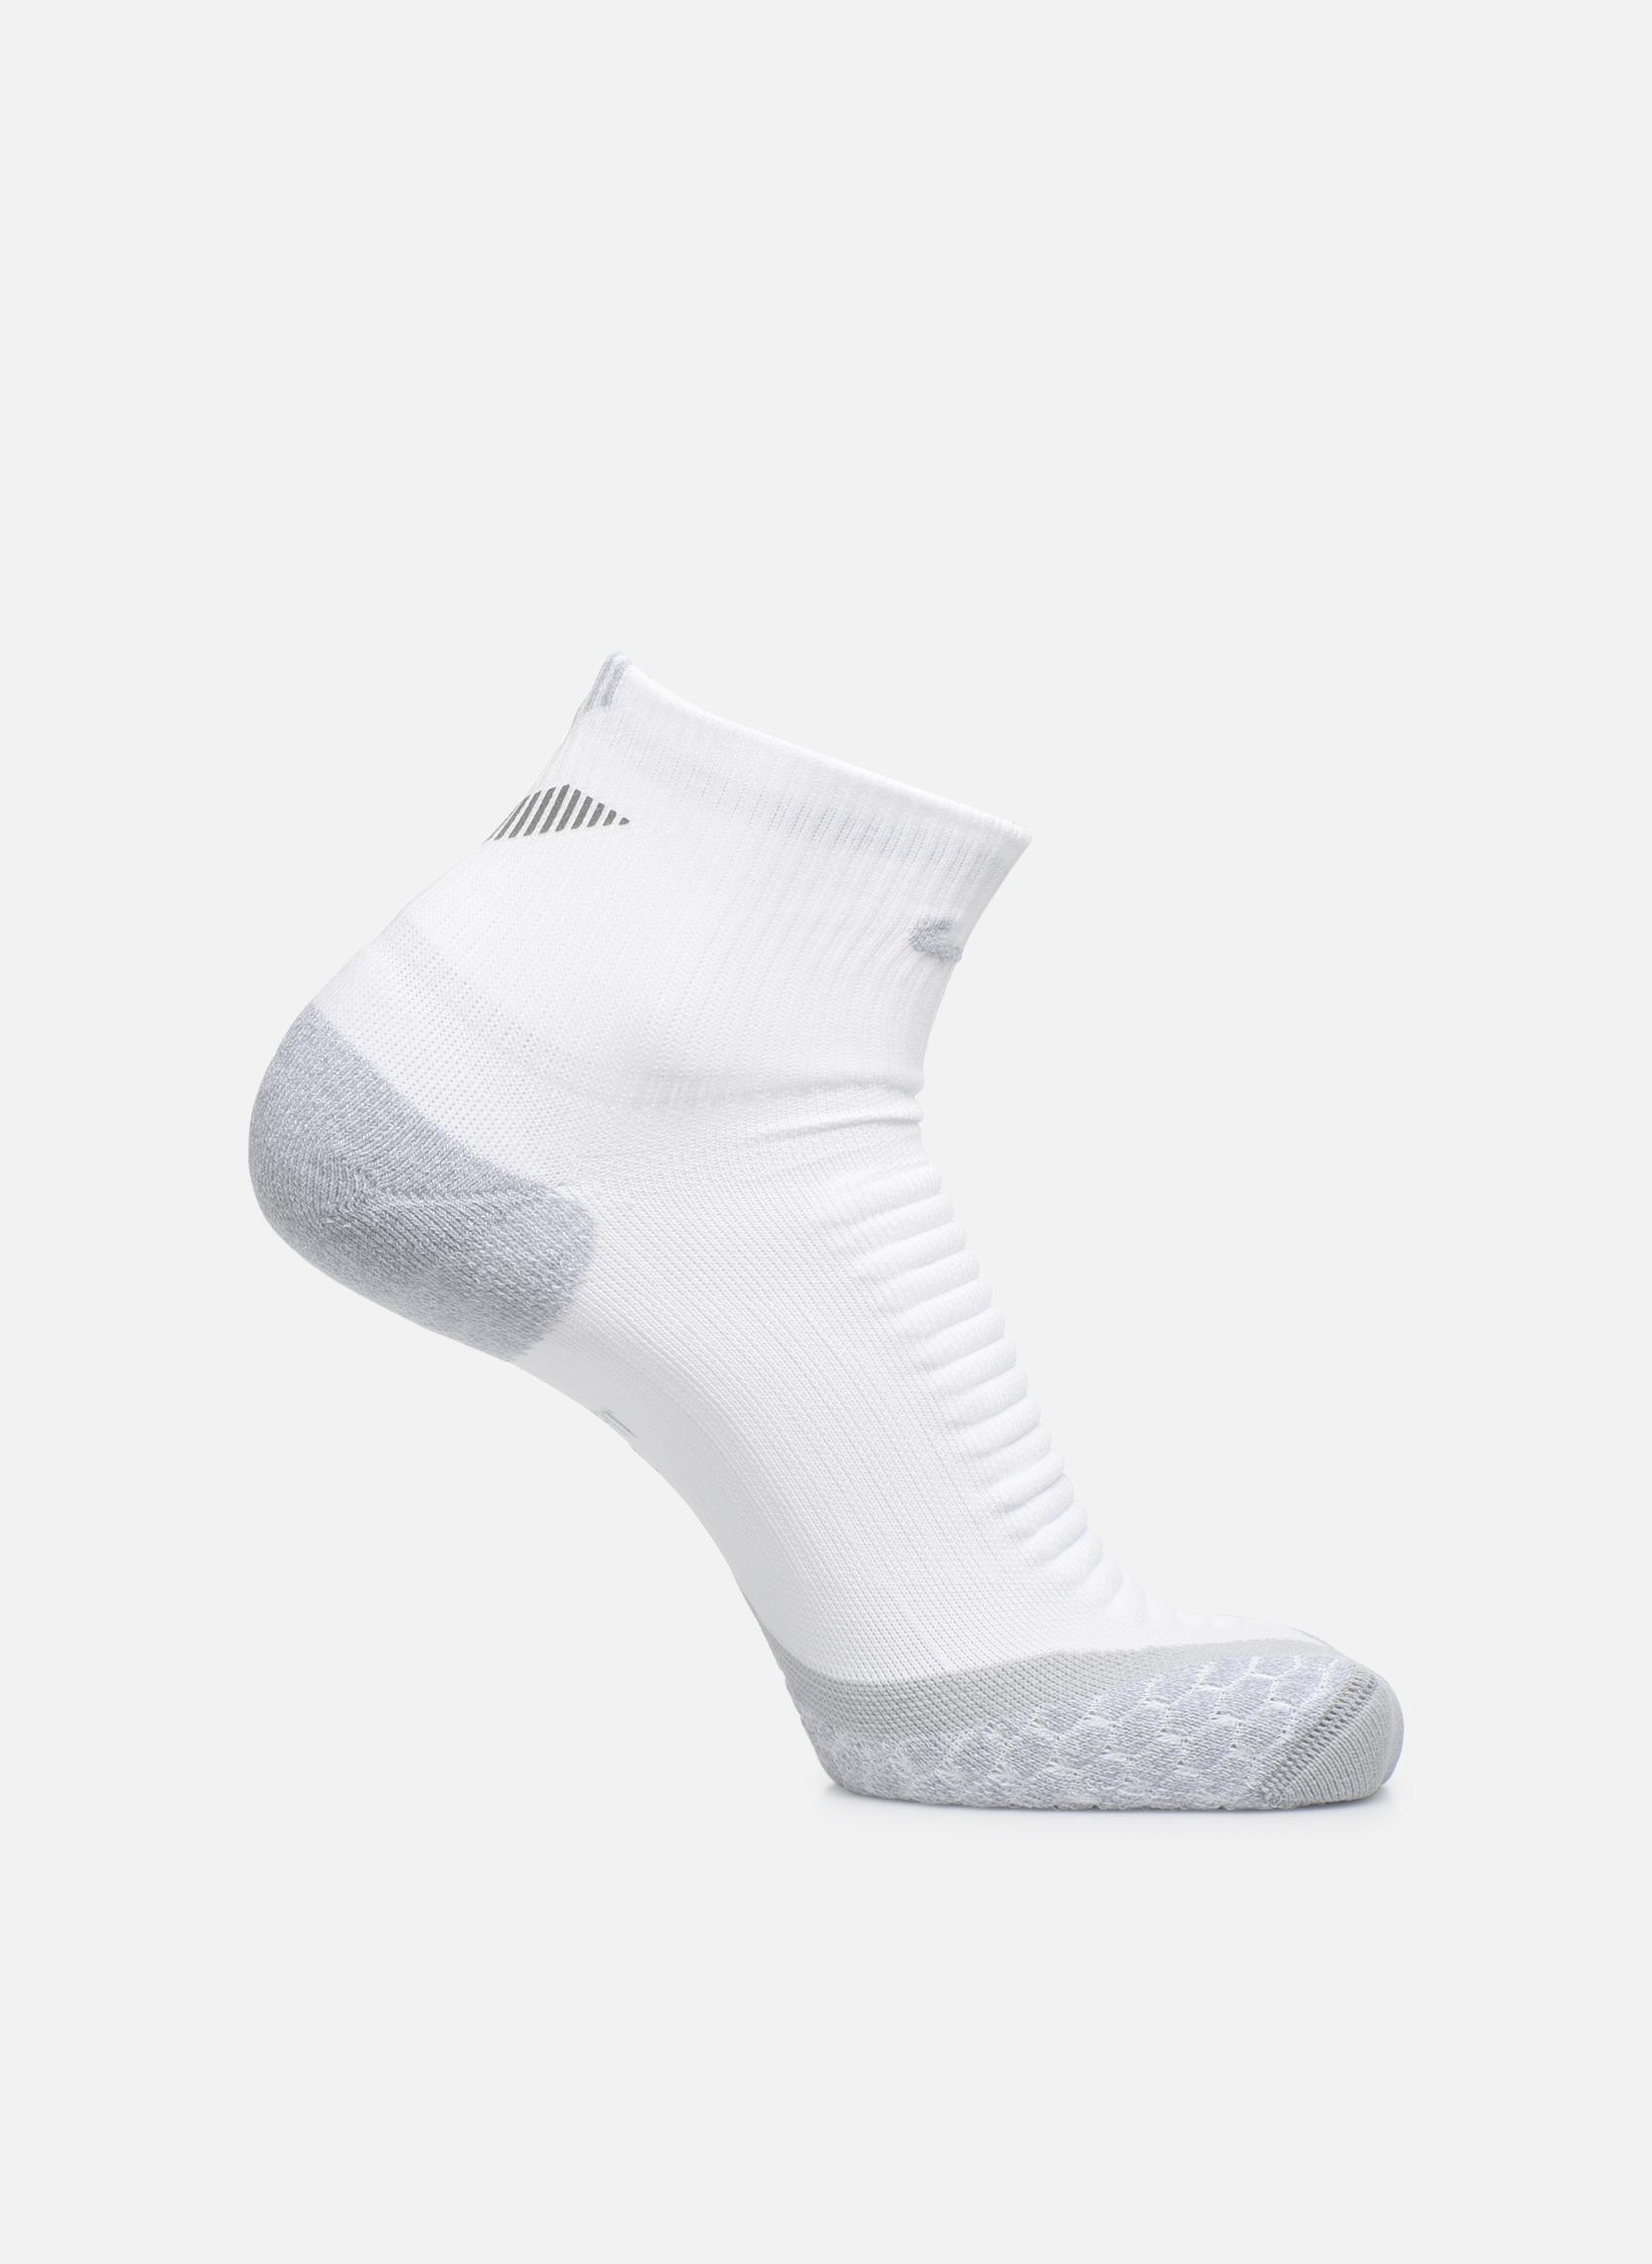 Socken & Strumpfhosen Accessoires Nike Elite Cushion Quarter Running Sock